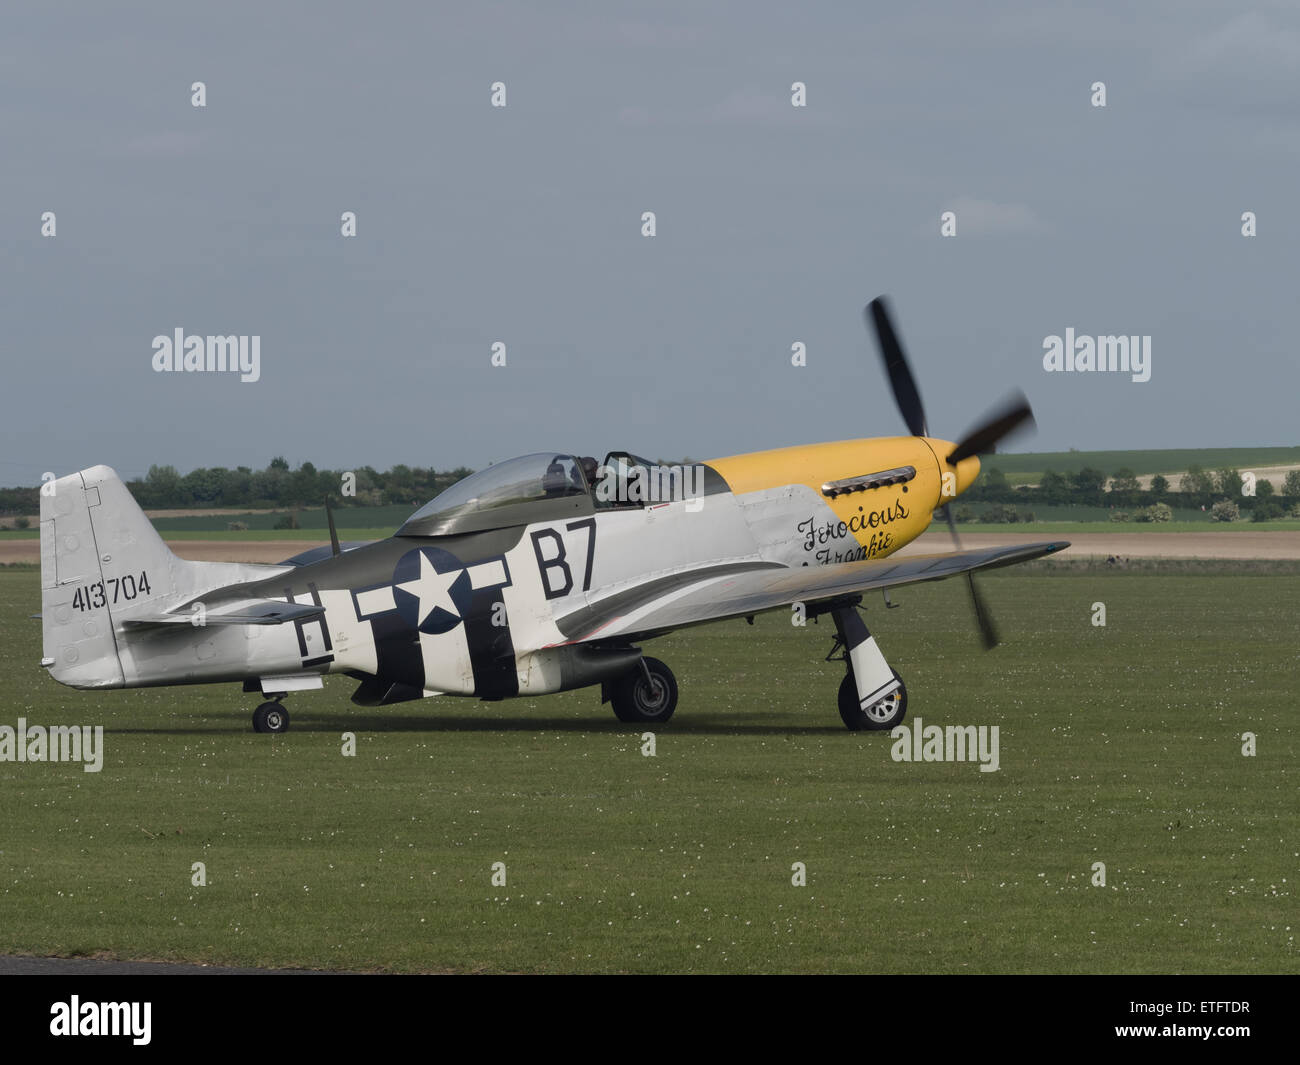 A Fighter P Stockfotos & A Fighter P Bilder - Seite 11 - Alamy